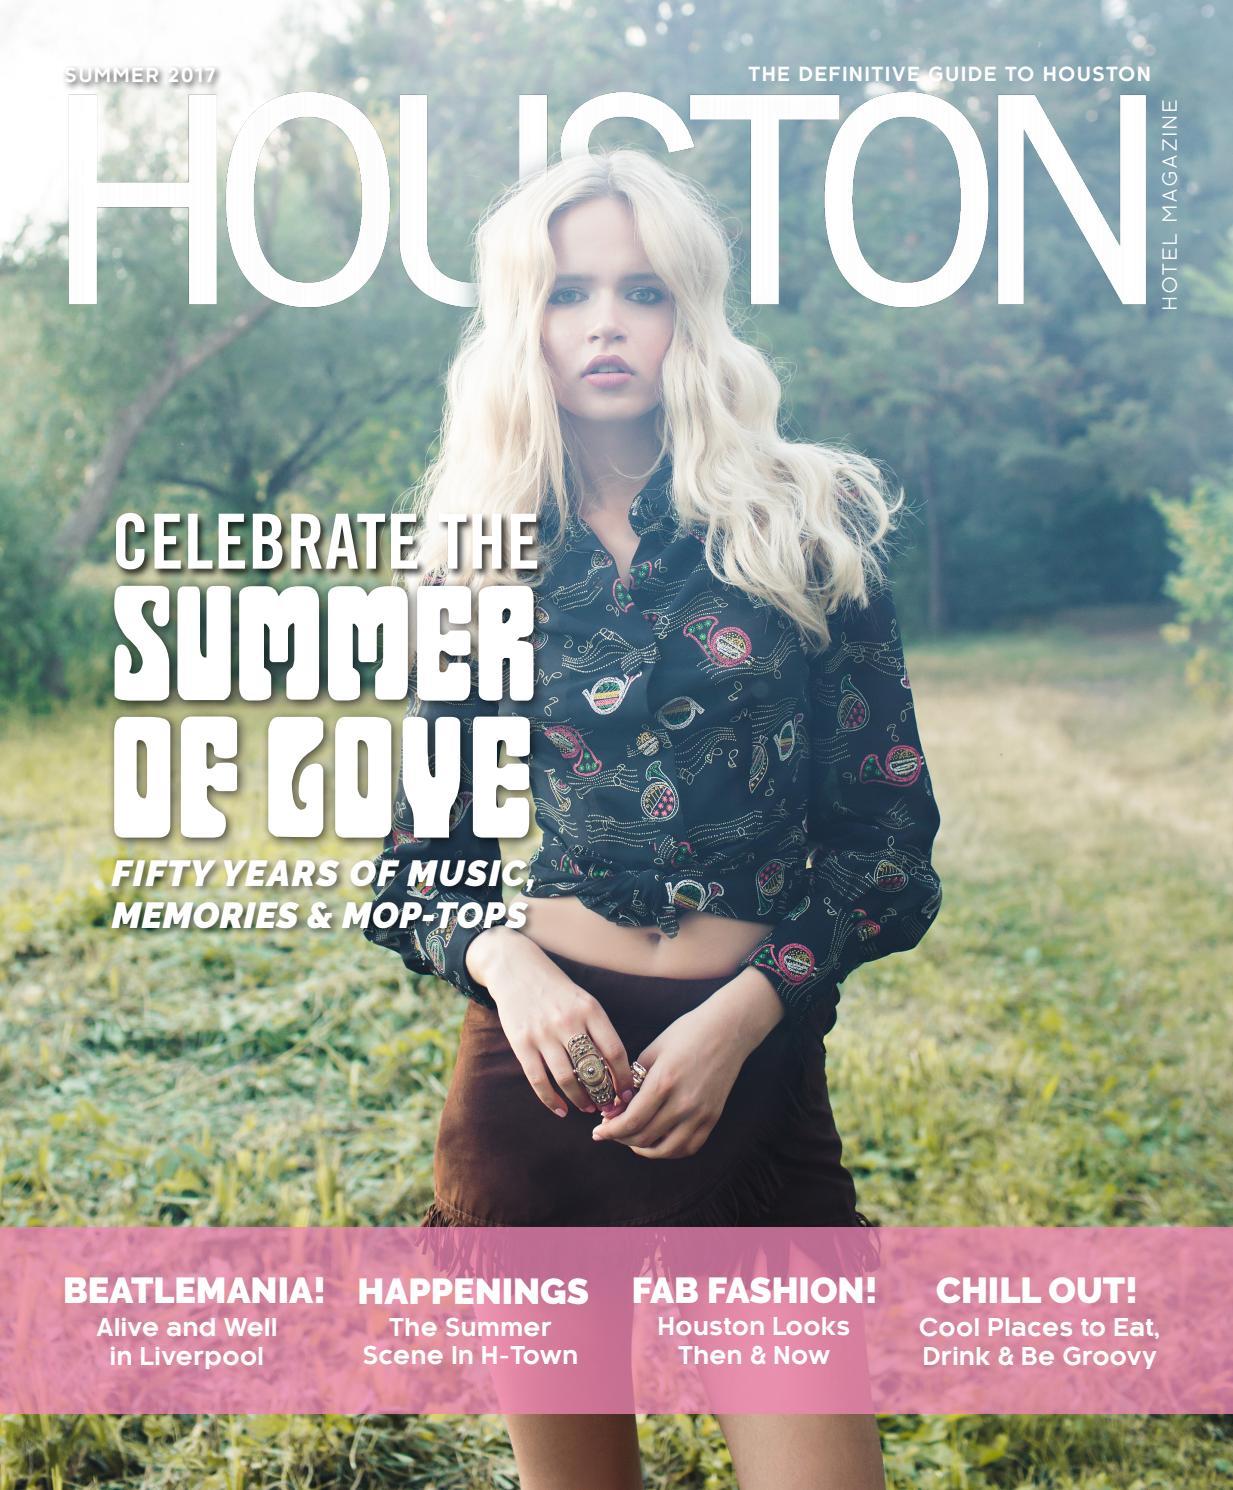 Houston Hotel Magazine Summer 2017 by Dallas Hotel Magazine - issuu